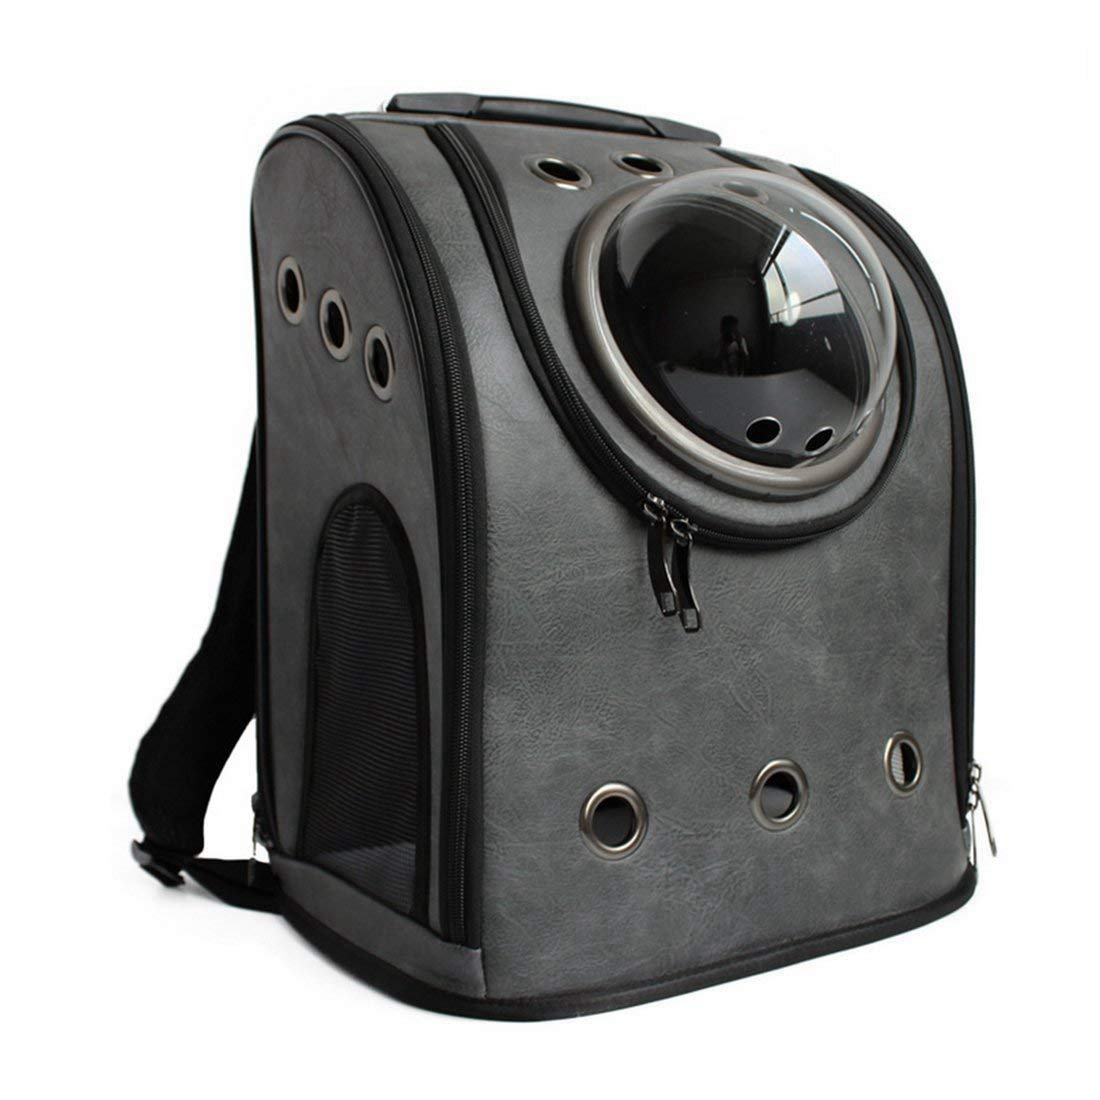 Pet Carrier Backpack, Petforu Space Capsule Dog Cat Small Animals Travel Bag - Dark Grey